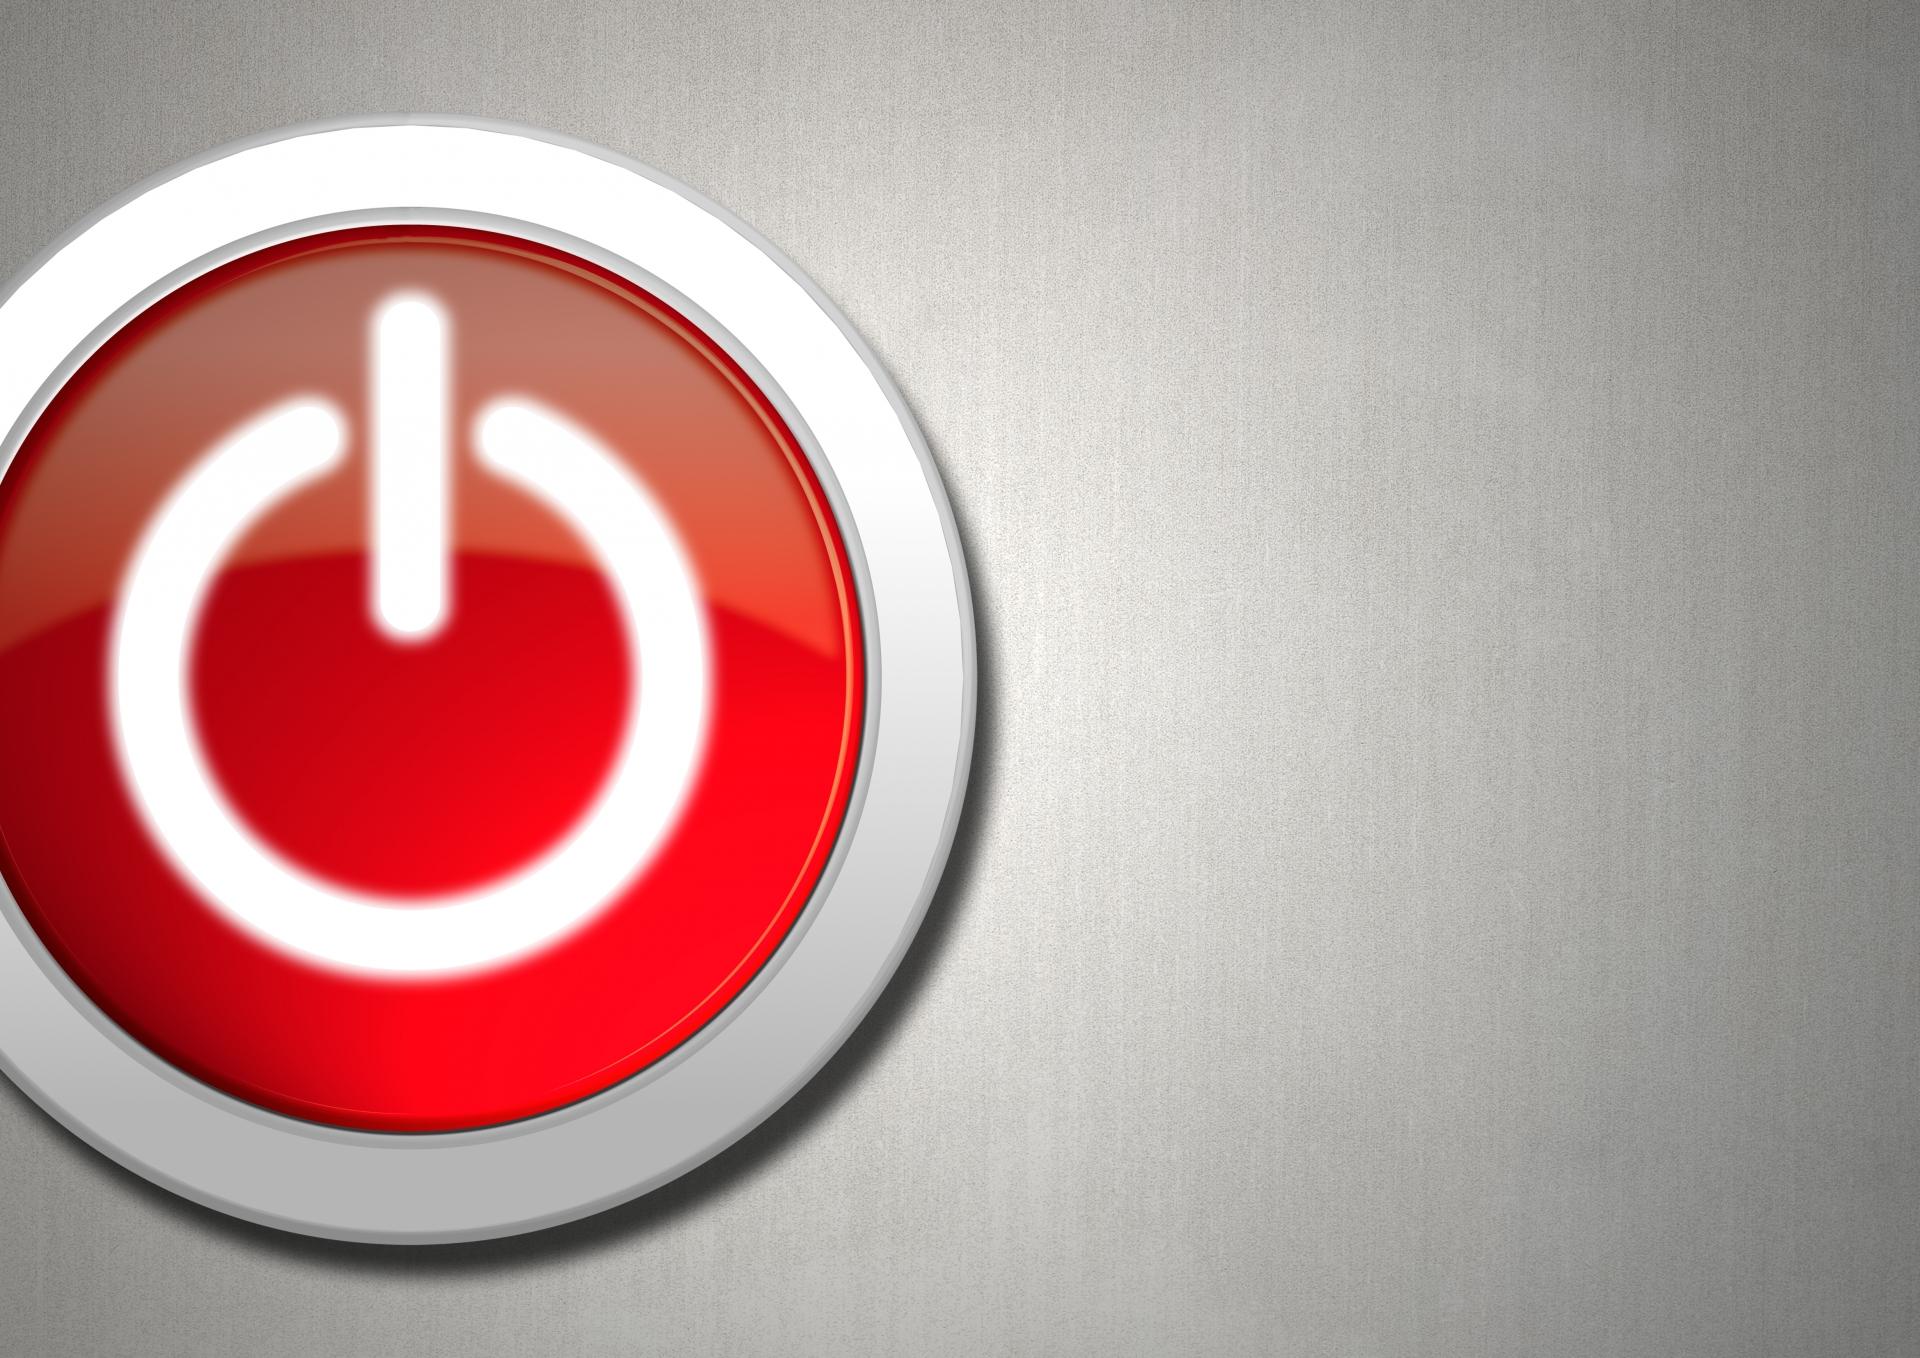 Yahoo!ショッピング出店者向けのクリック型課金広告サービス開始